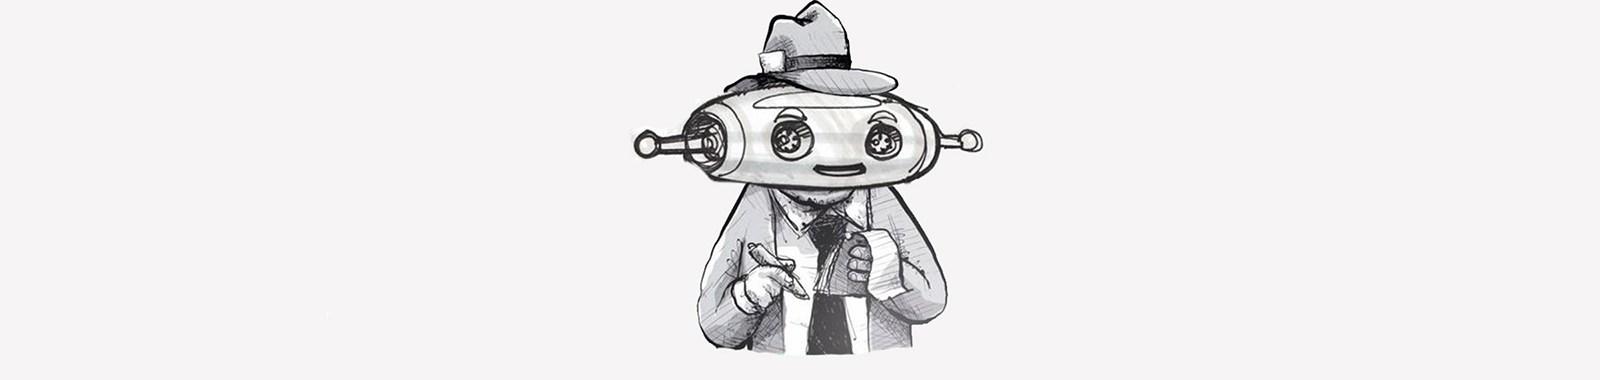 robot-reporter-eye